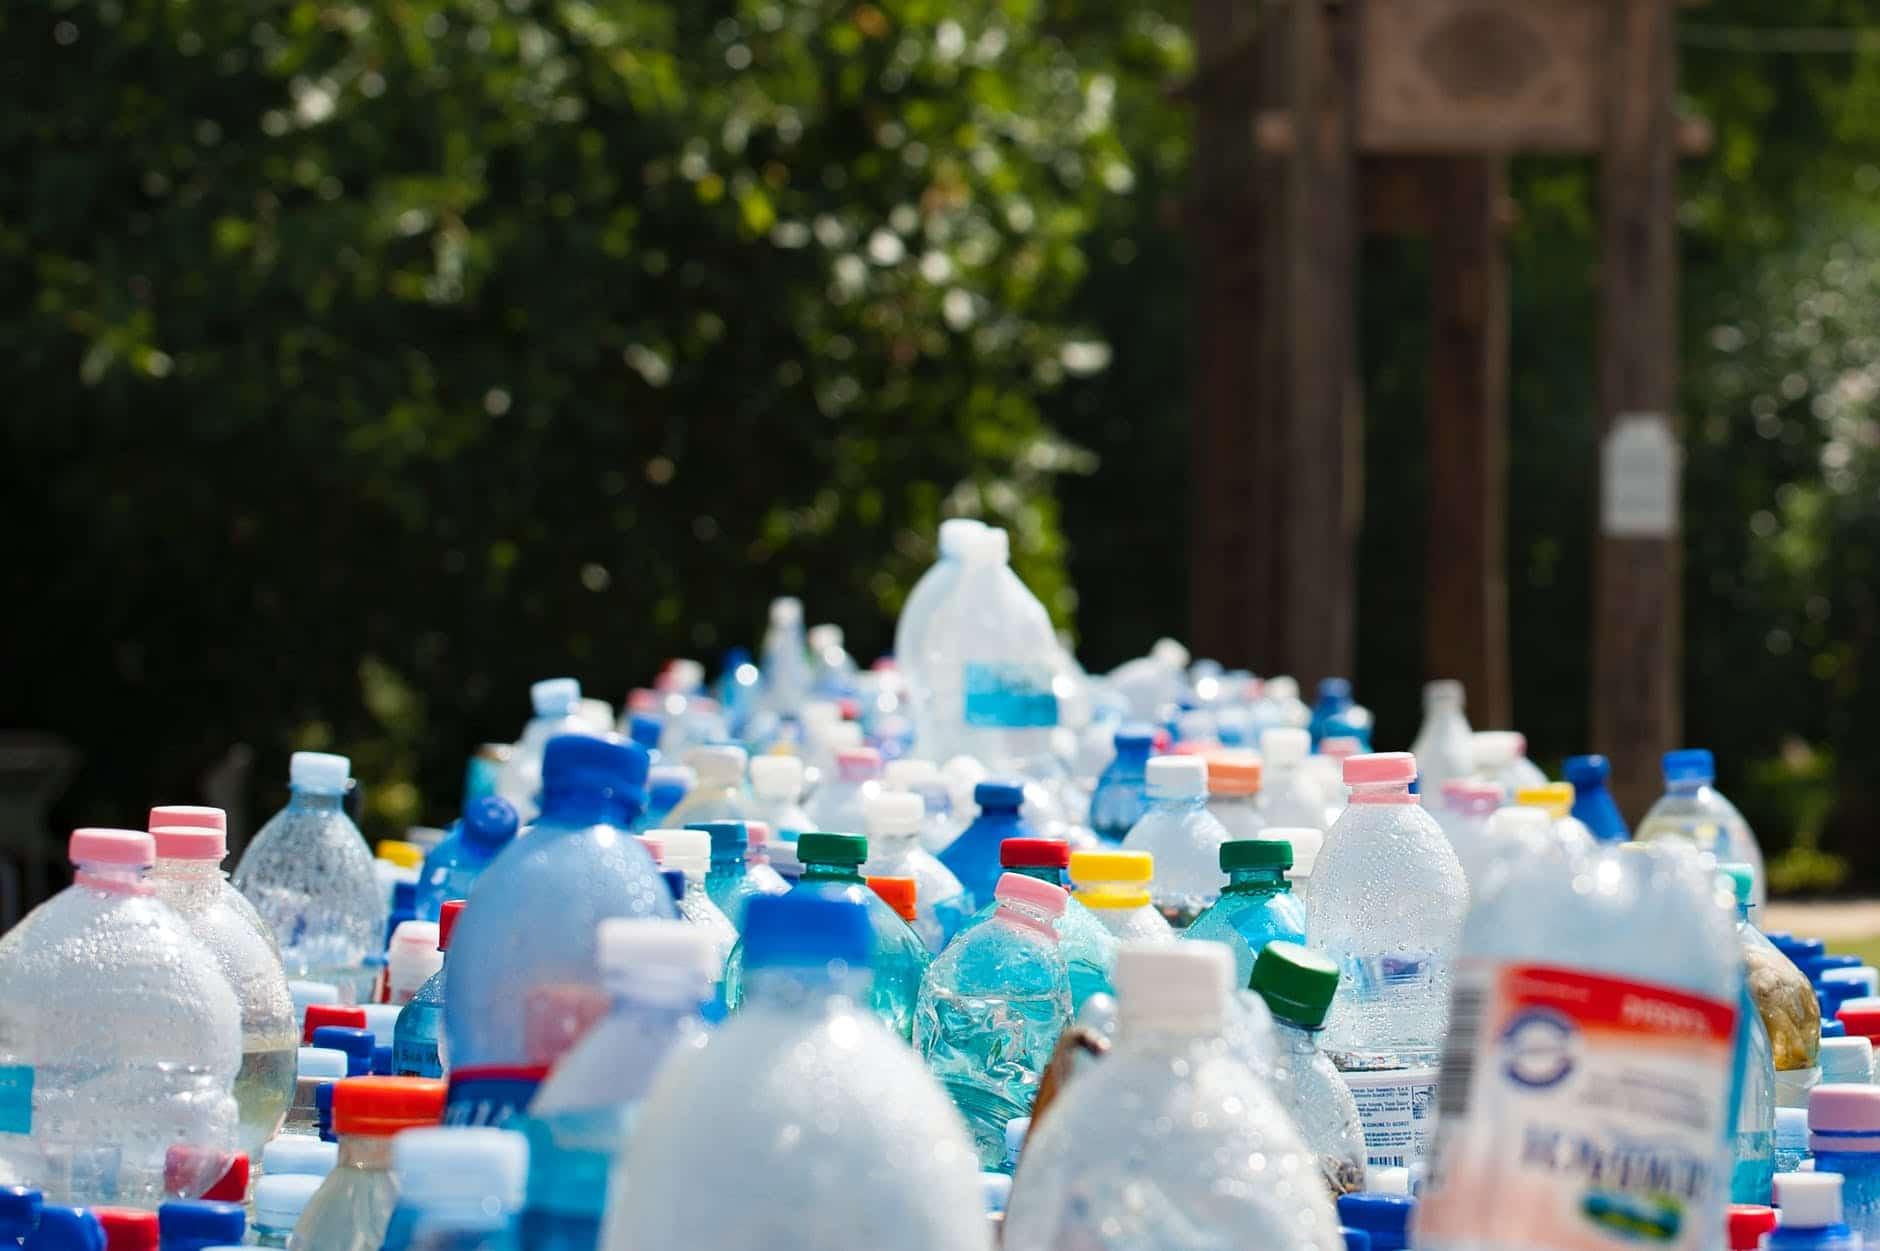 Влияния пластика в воде на здоровье